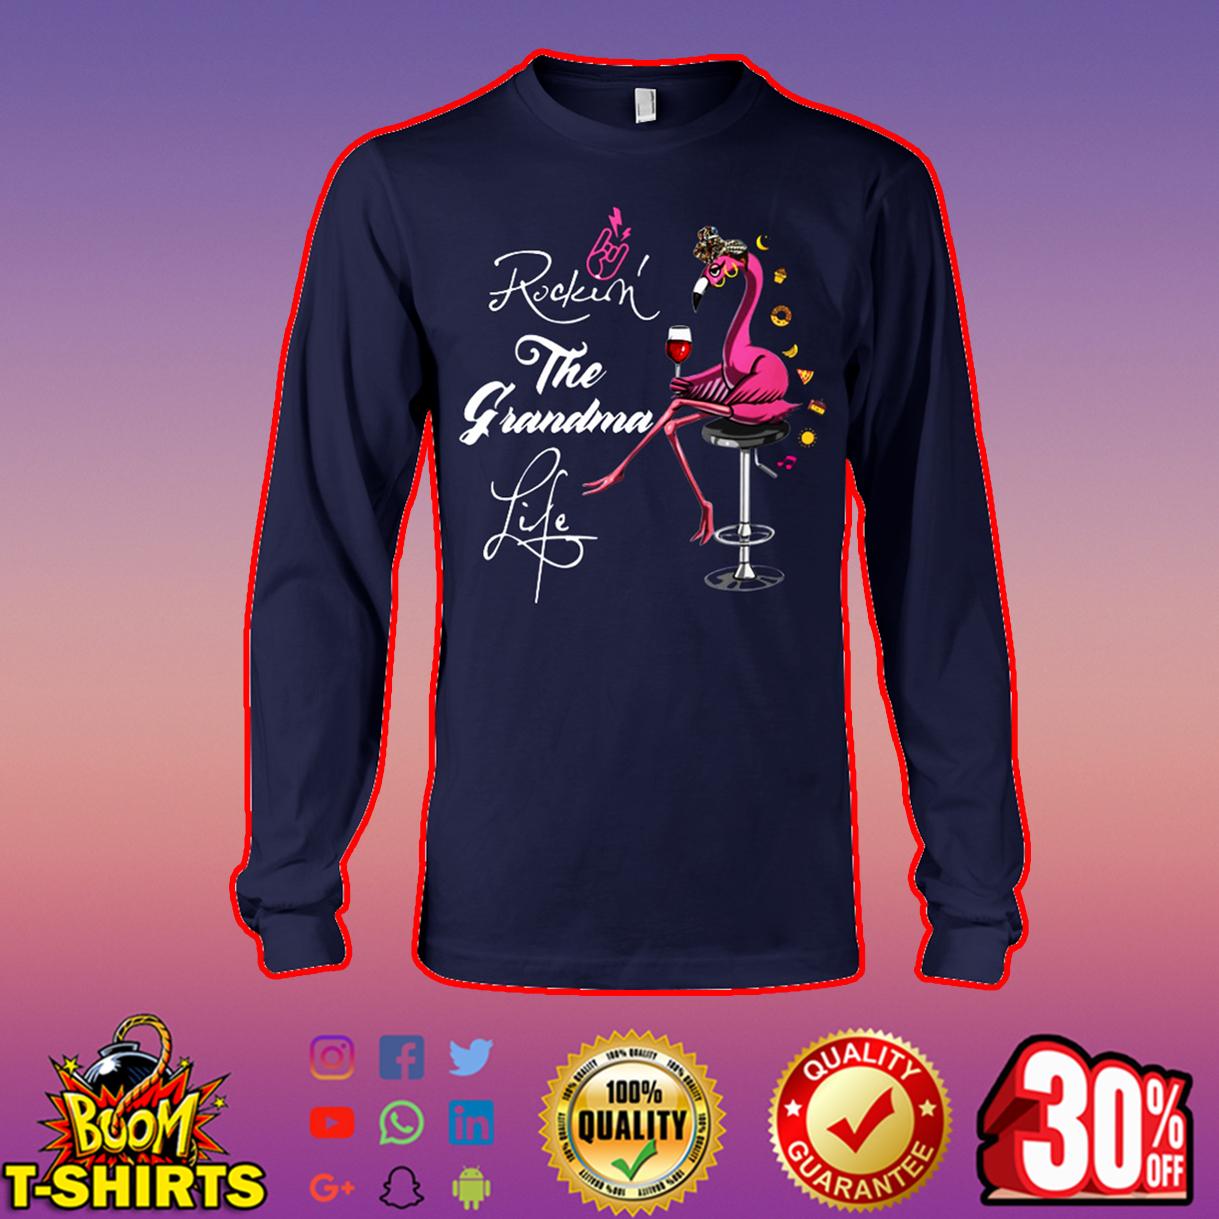 Flamingo rockin' the grandma life long sleeve tee